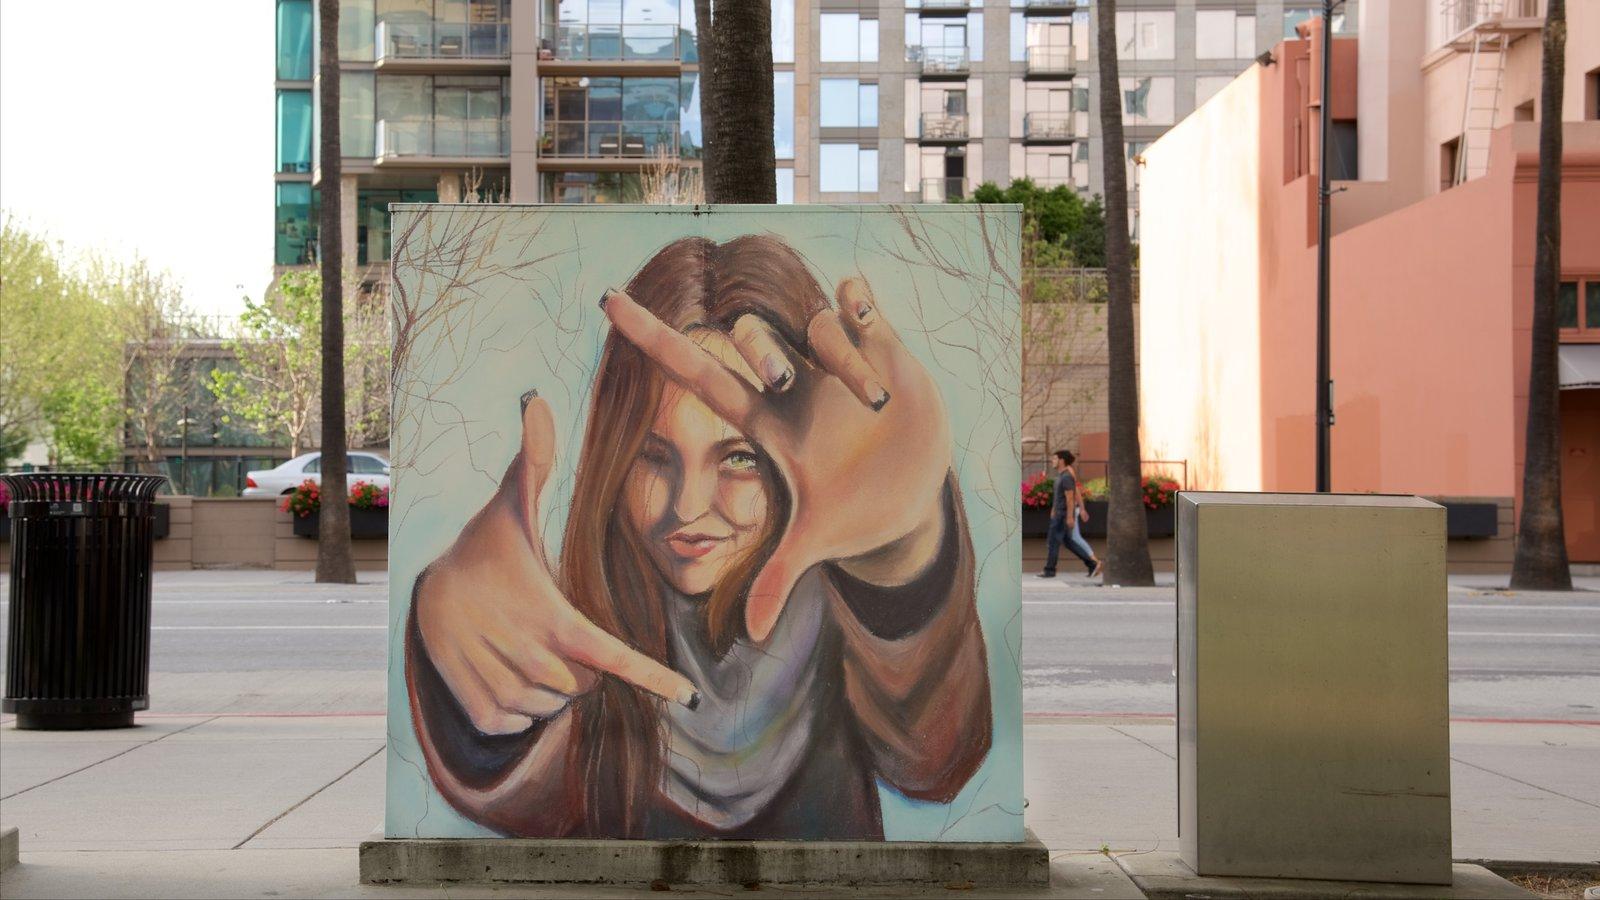 Bay Area caracterizando arte ao ar livre